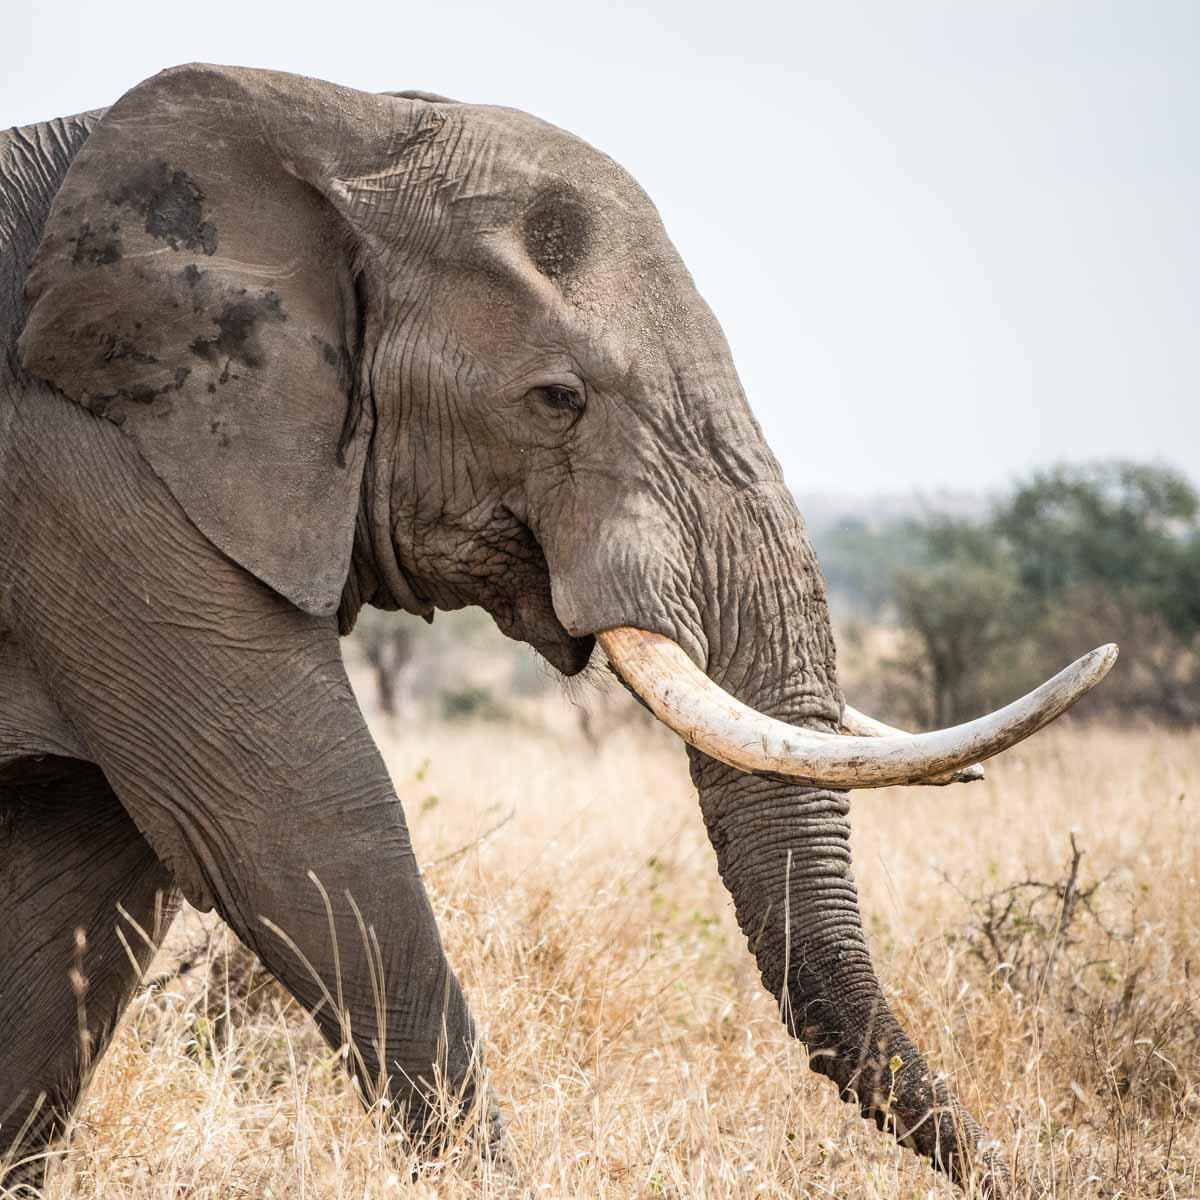 Elephant - Afrique du Sud - Park Kruger